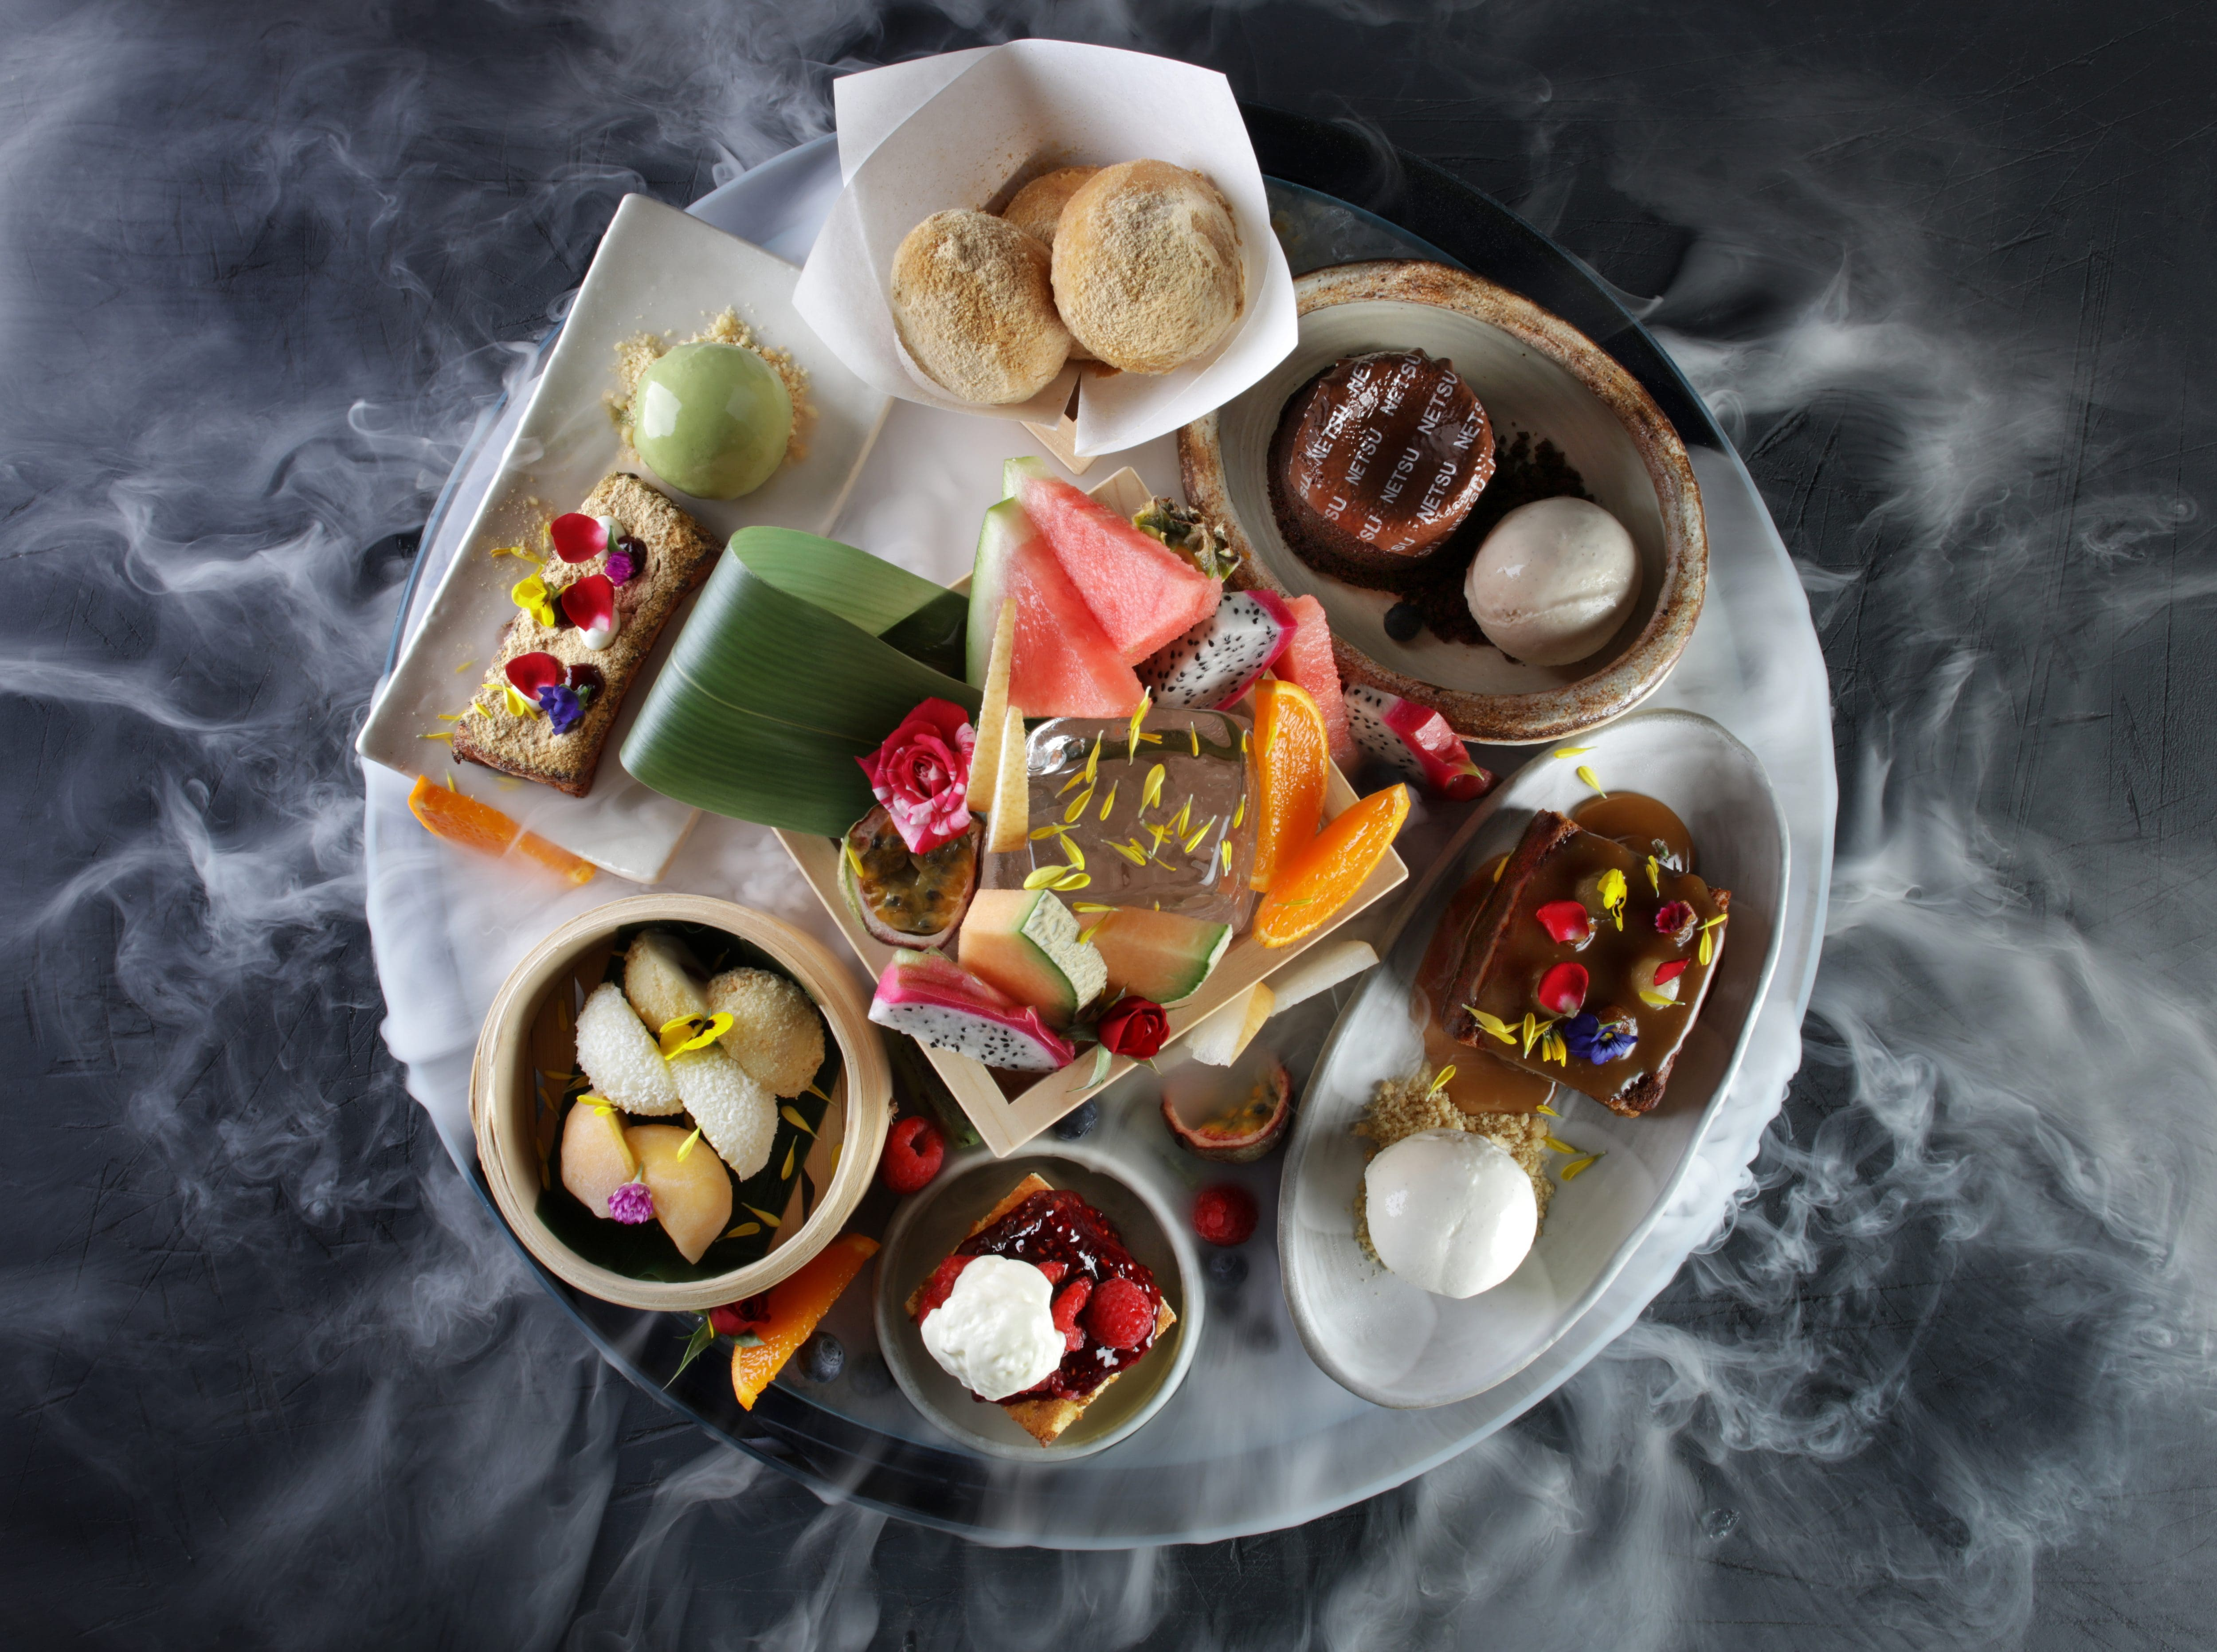 Desert platter at Netsu, Japanese Steakhouse, Mandarin Oriental, Dubai